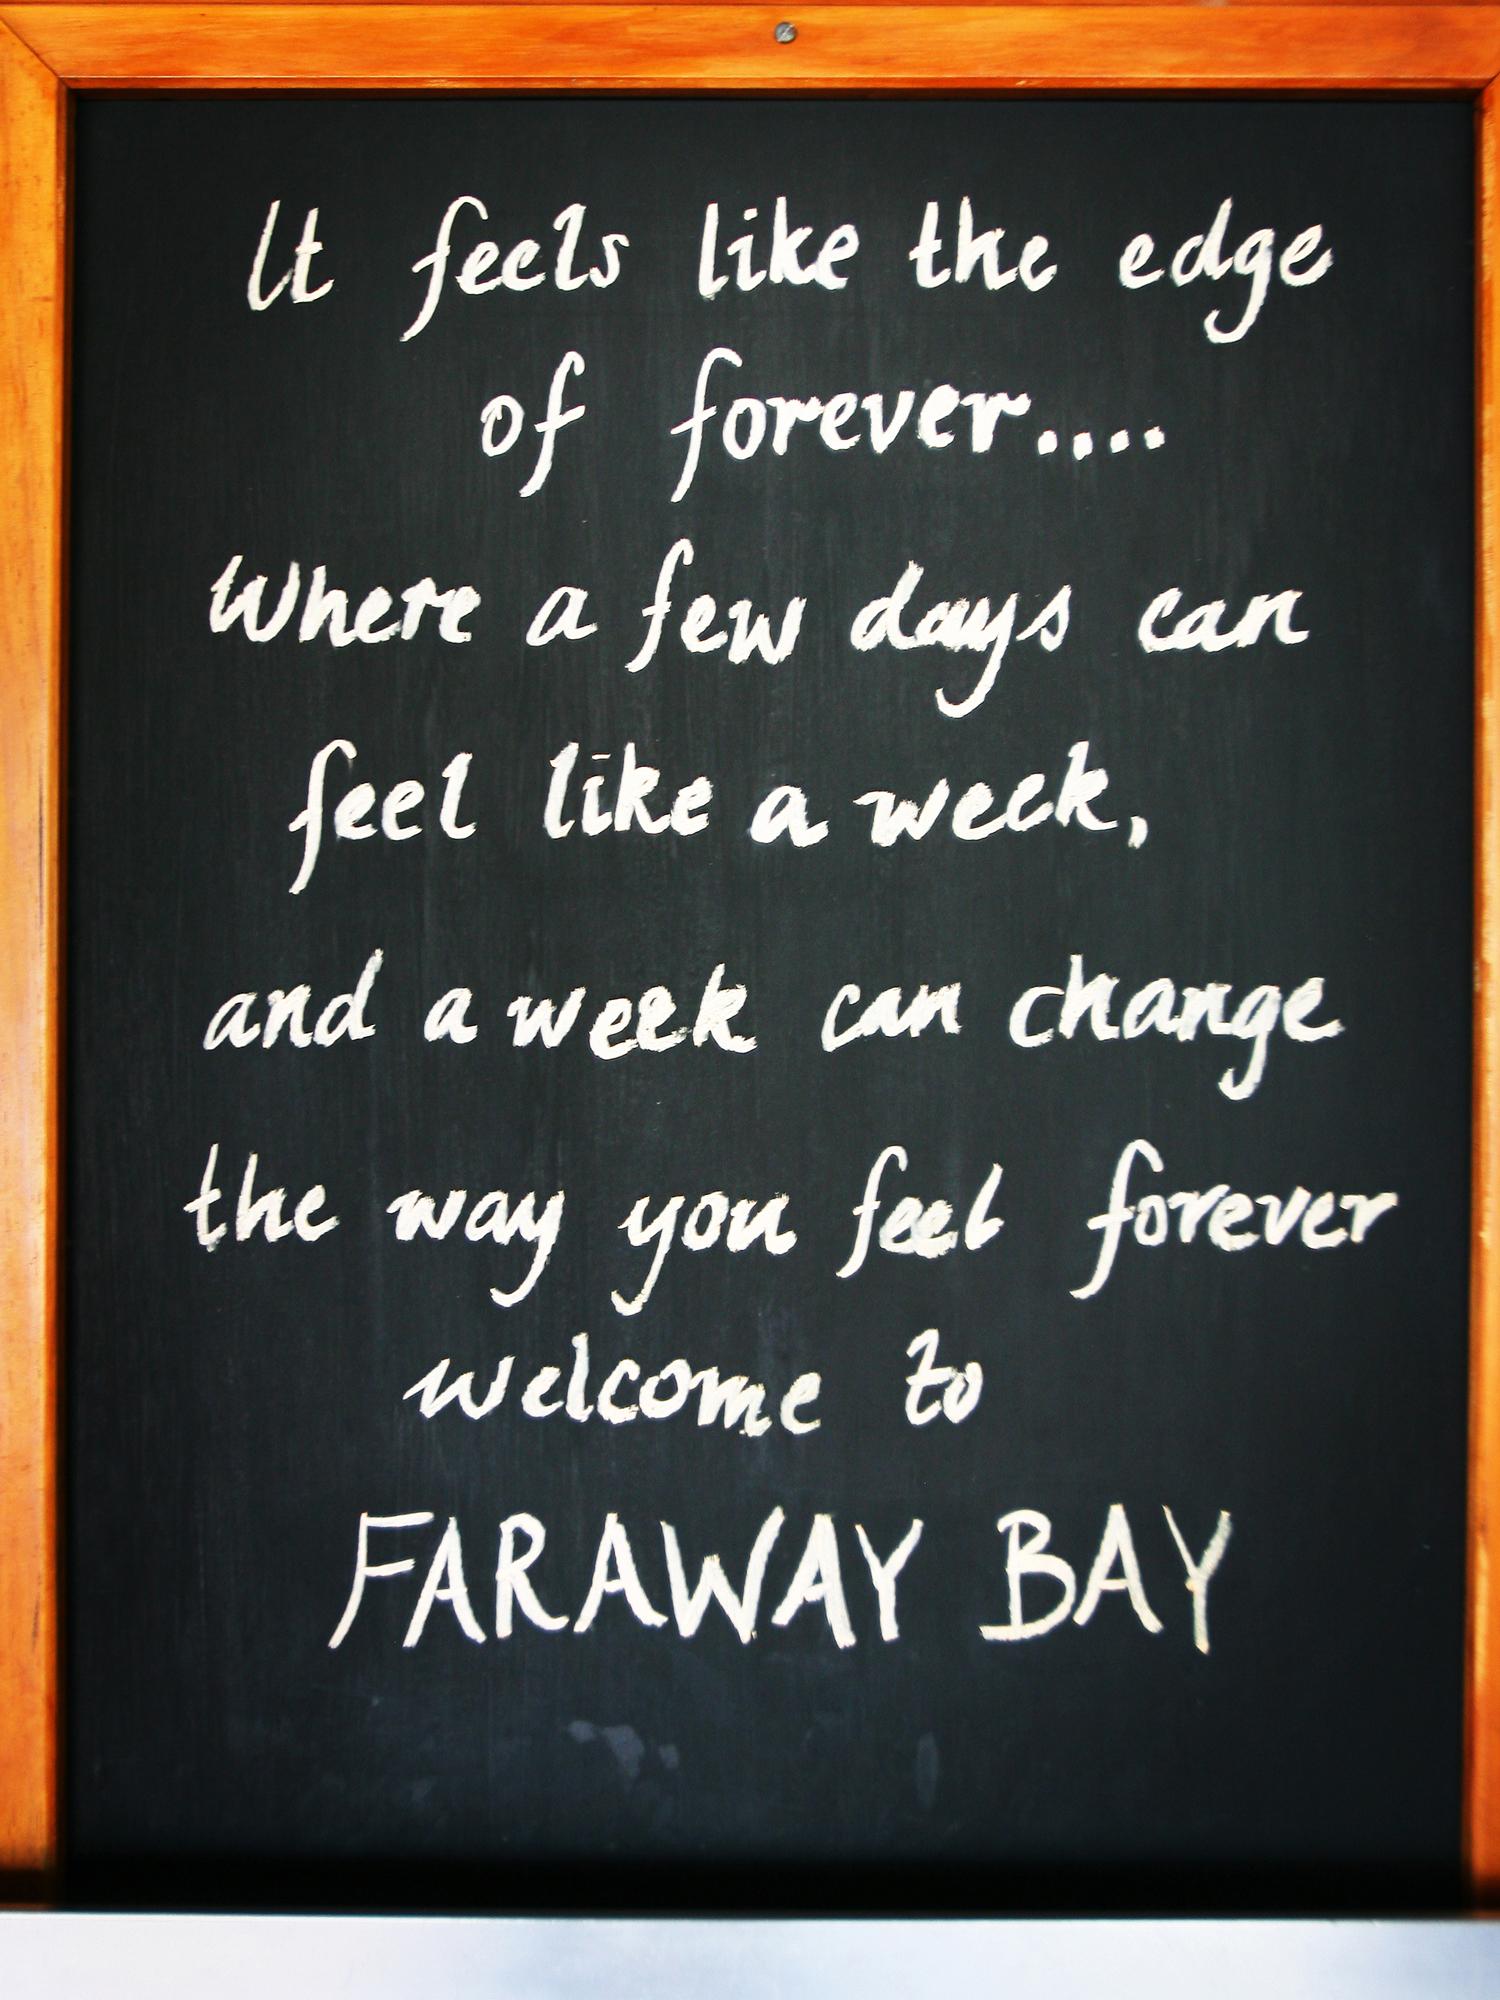 nathandyer_faraway_09